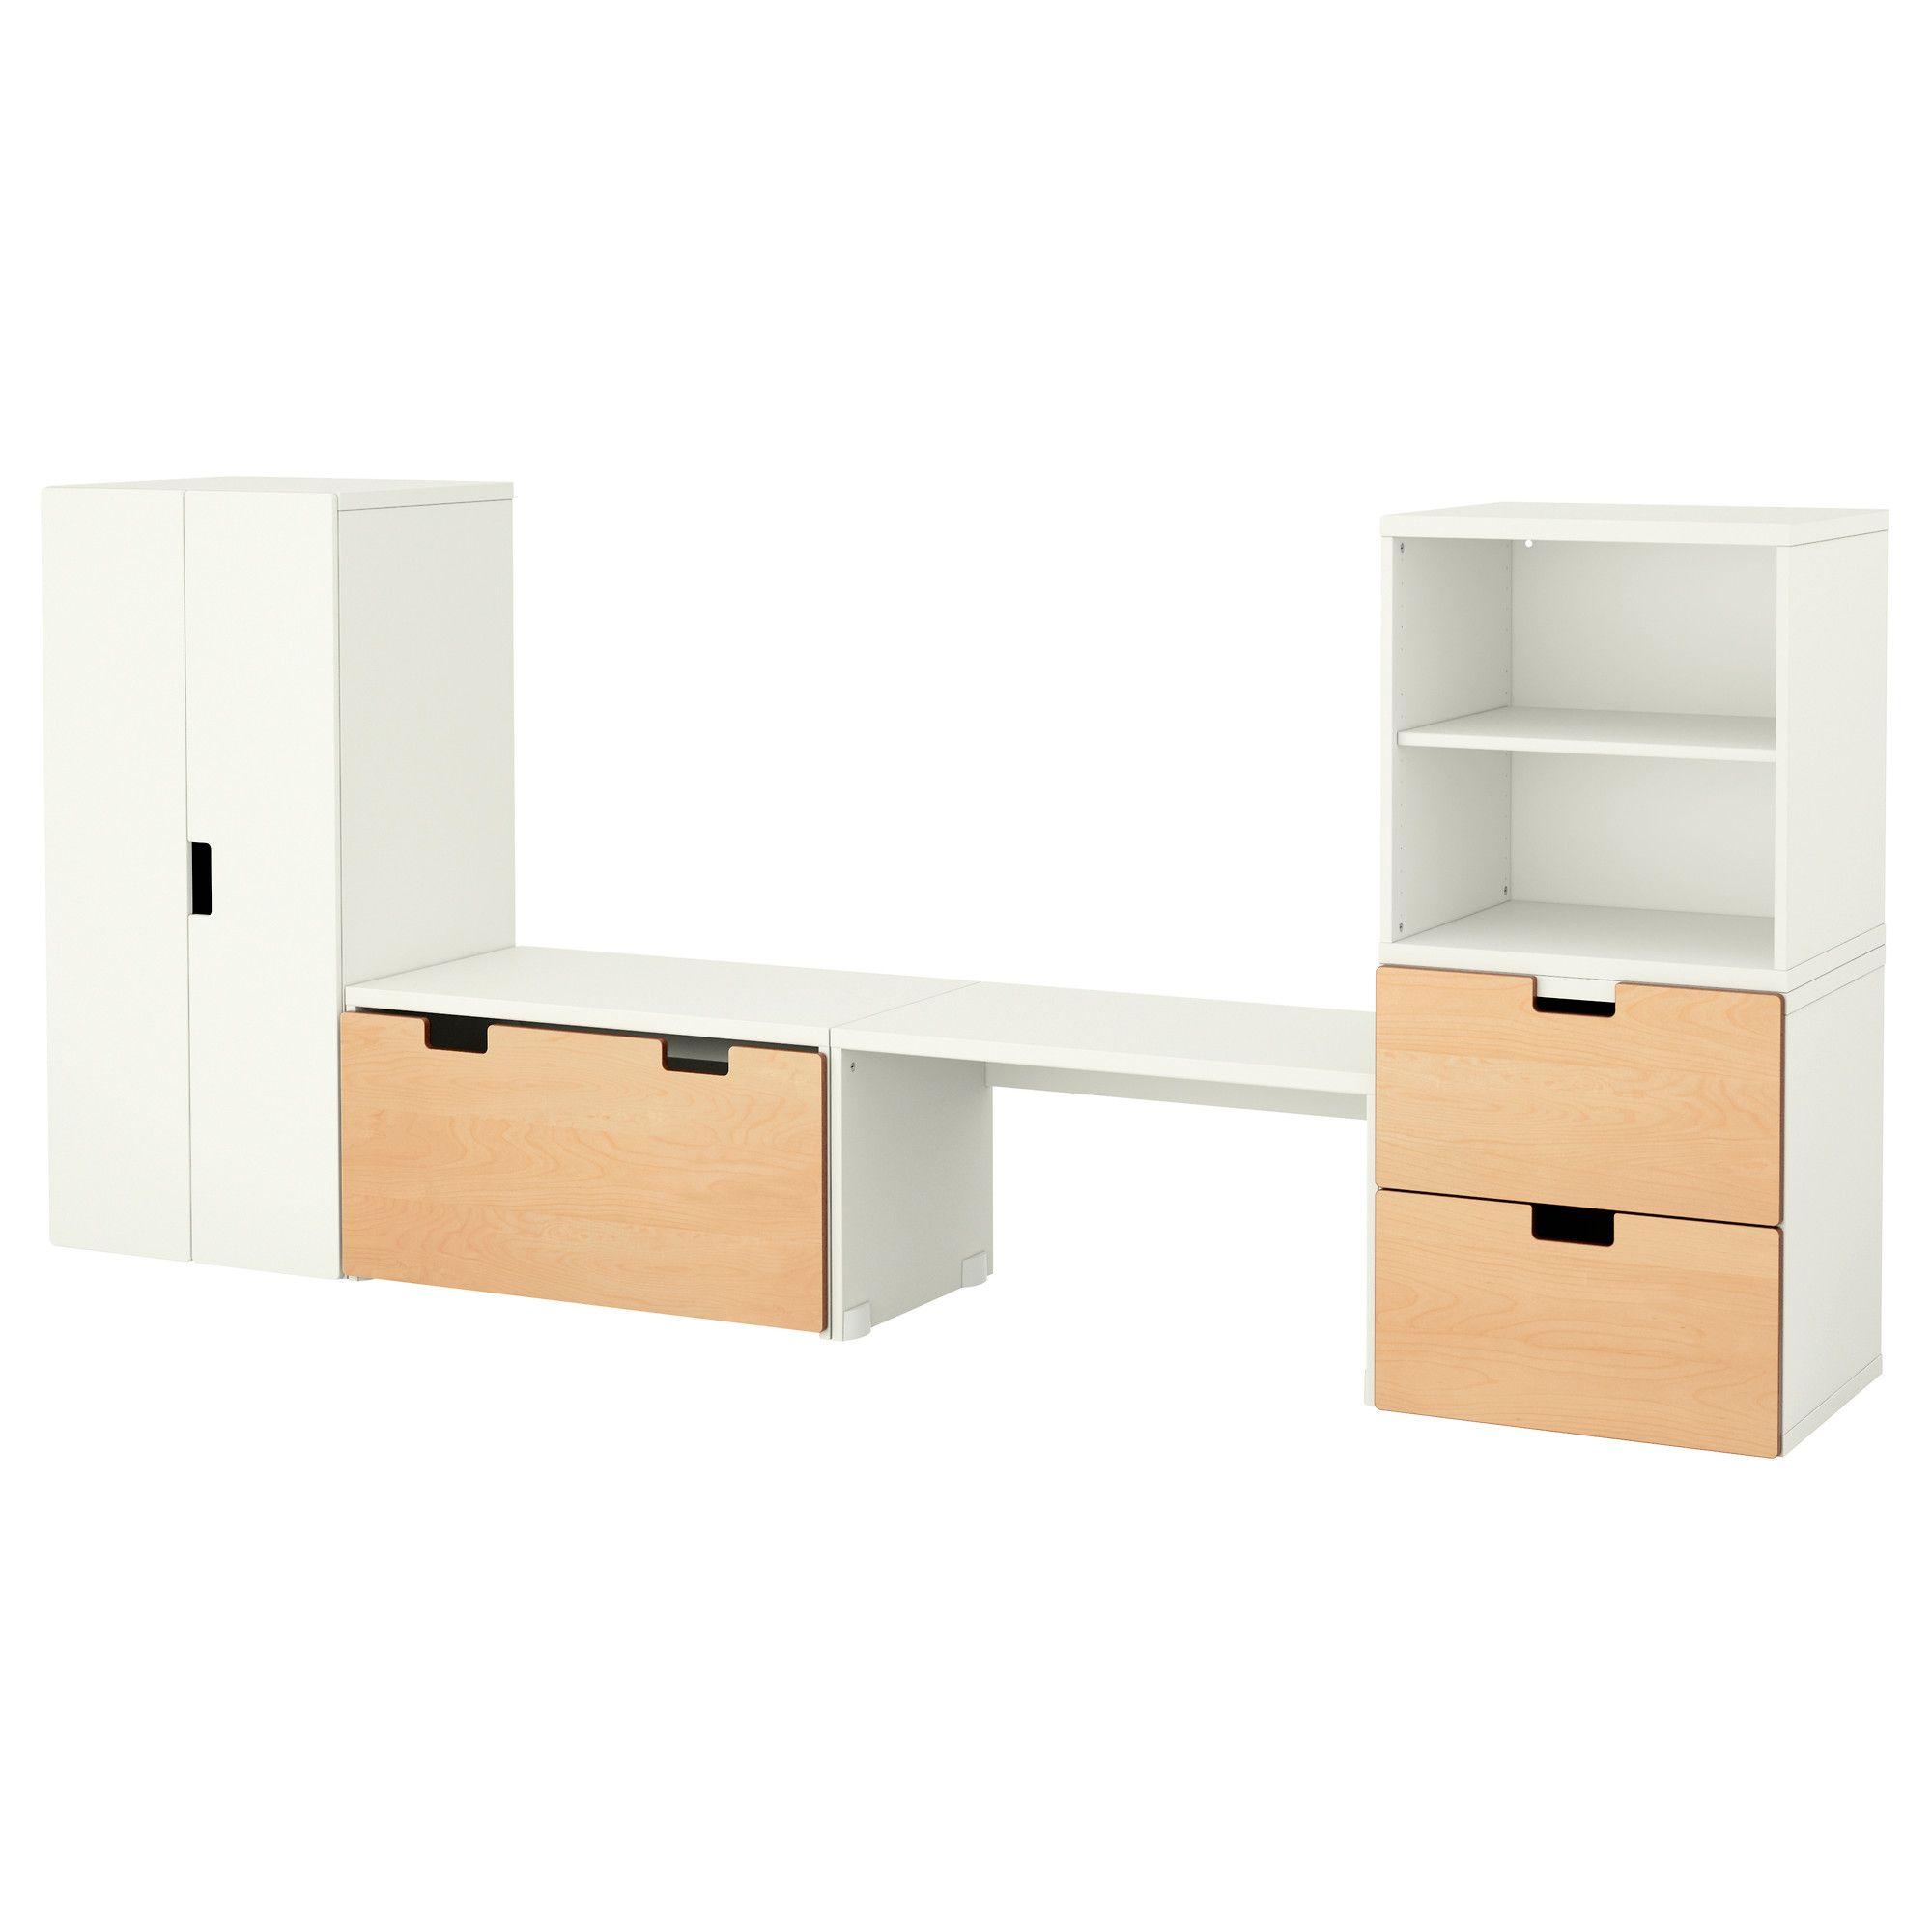 STUVA Comb almacenaje con banco - blanco/abedul - IKEA | cuarto de ...